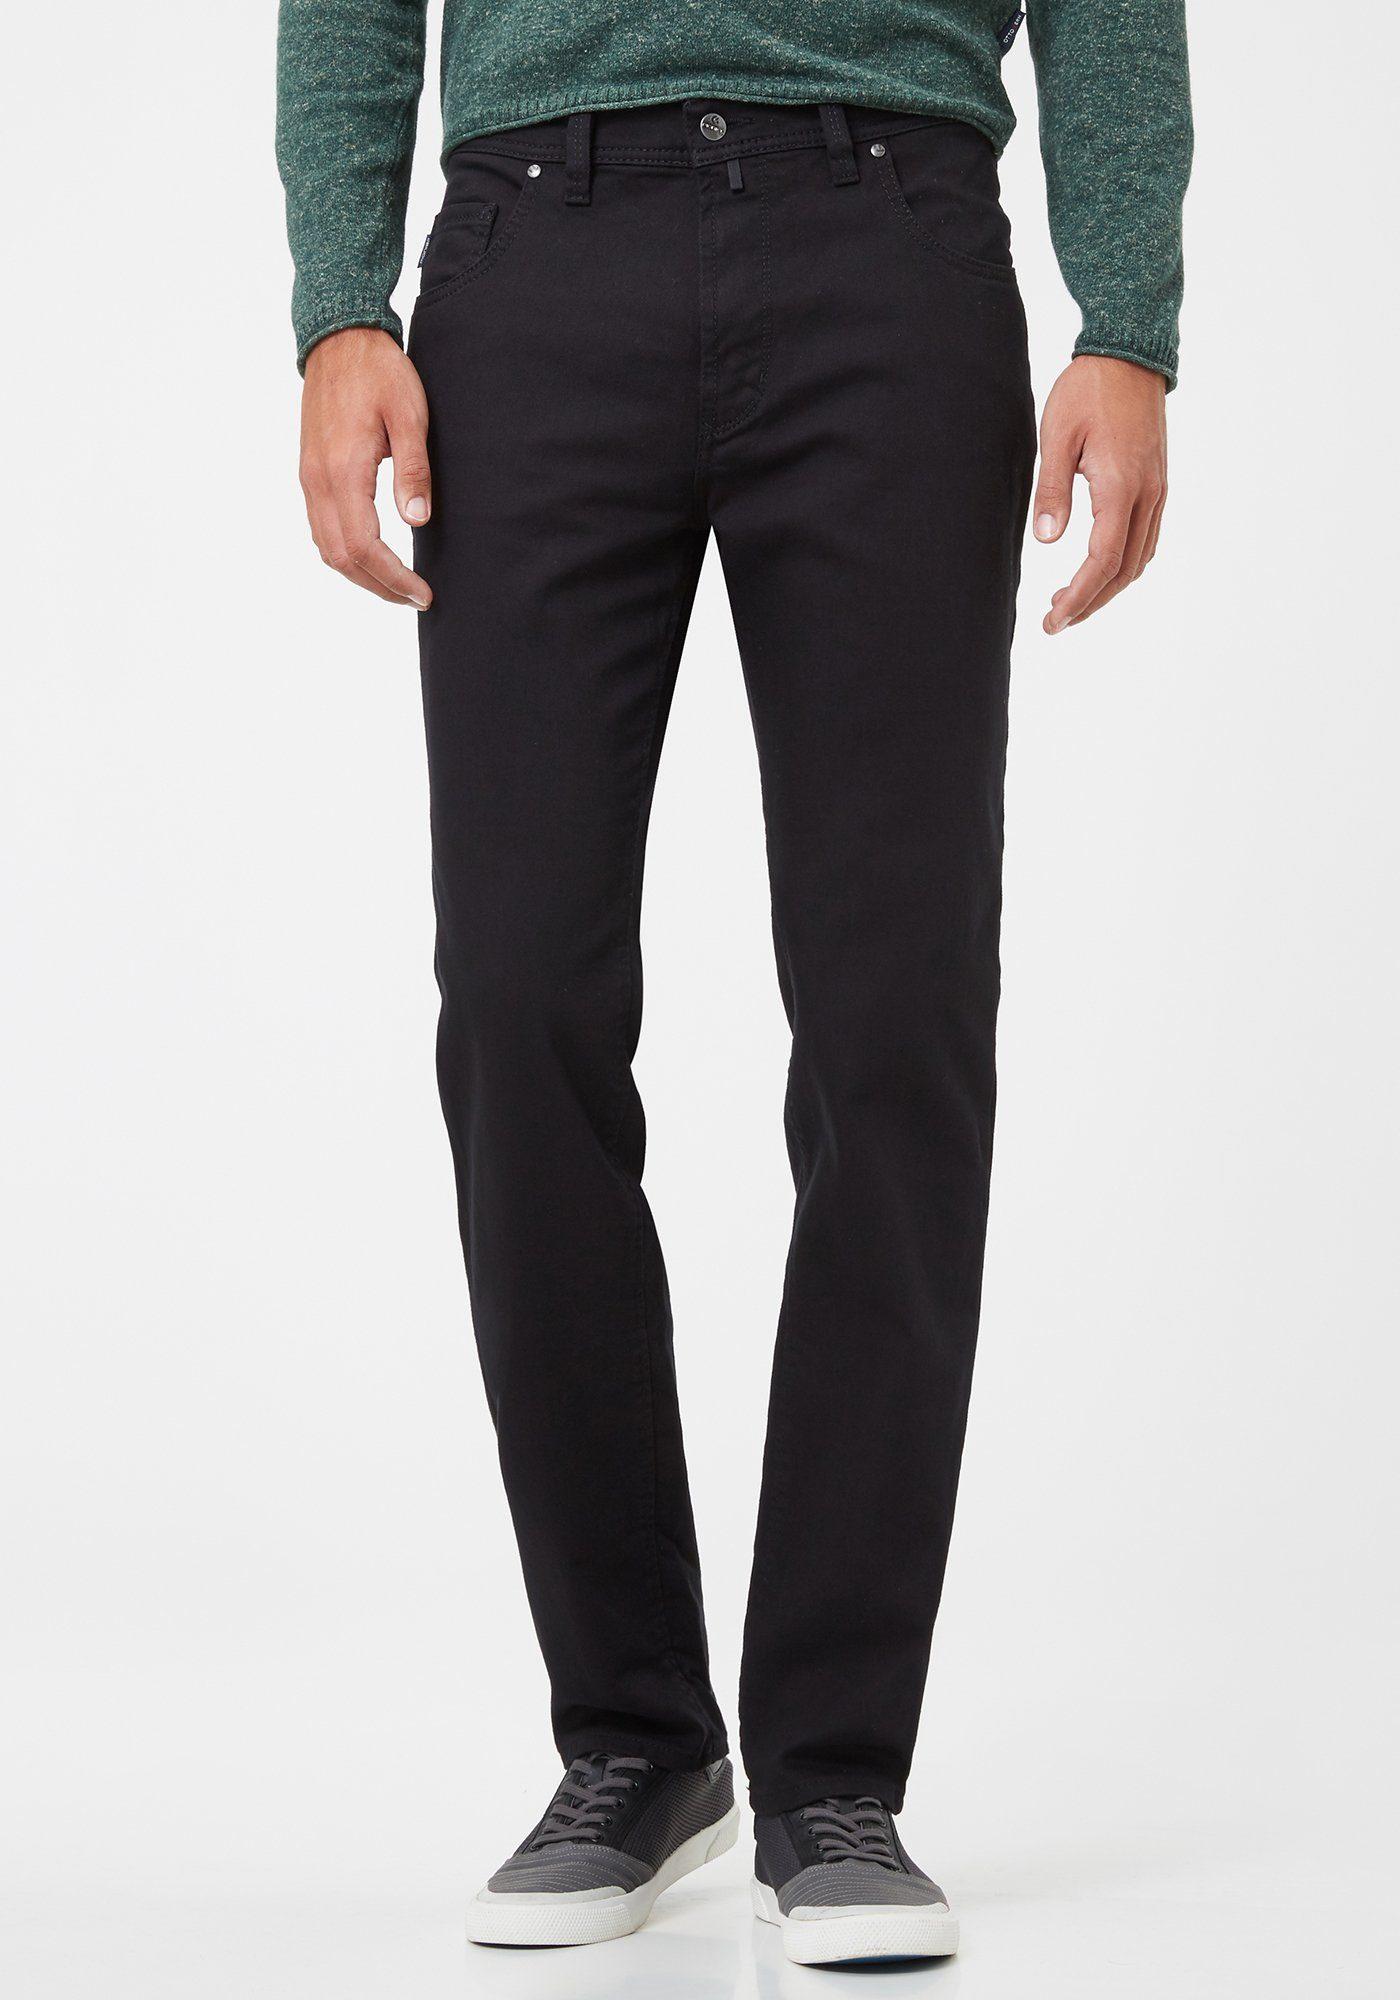 Pionier Jeans & Casuals Konvex Hose Denim Herren »Konvex PETER Comfort Fit«